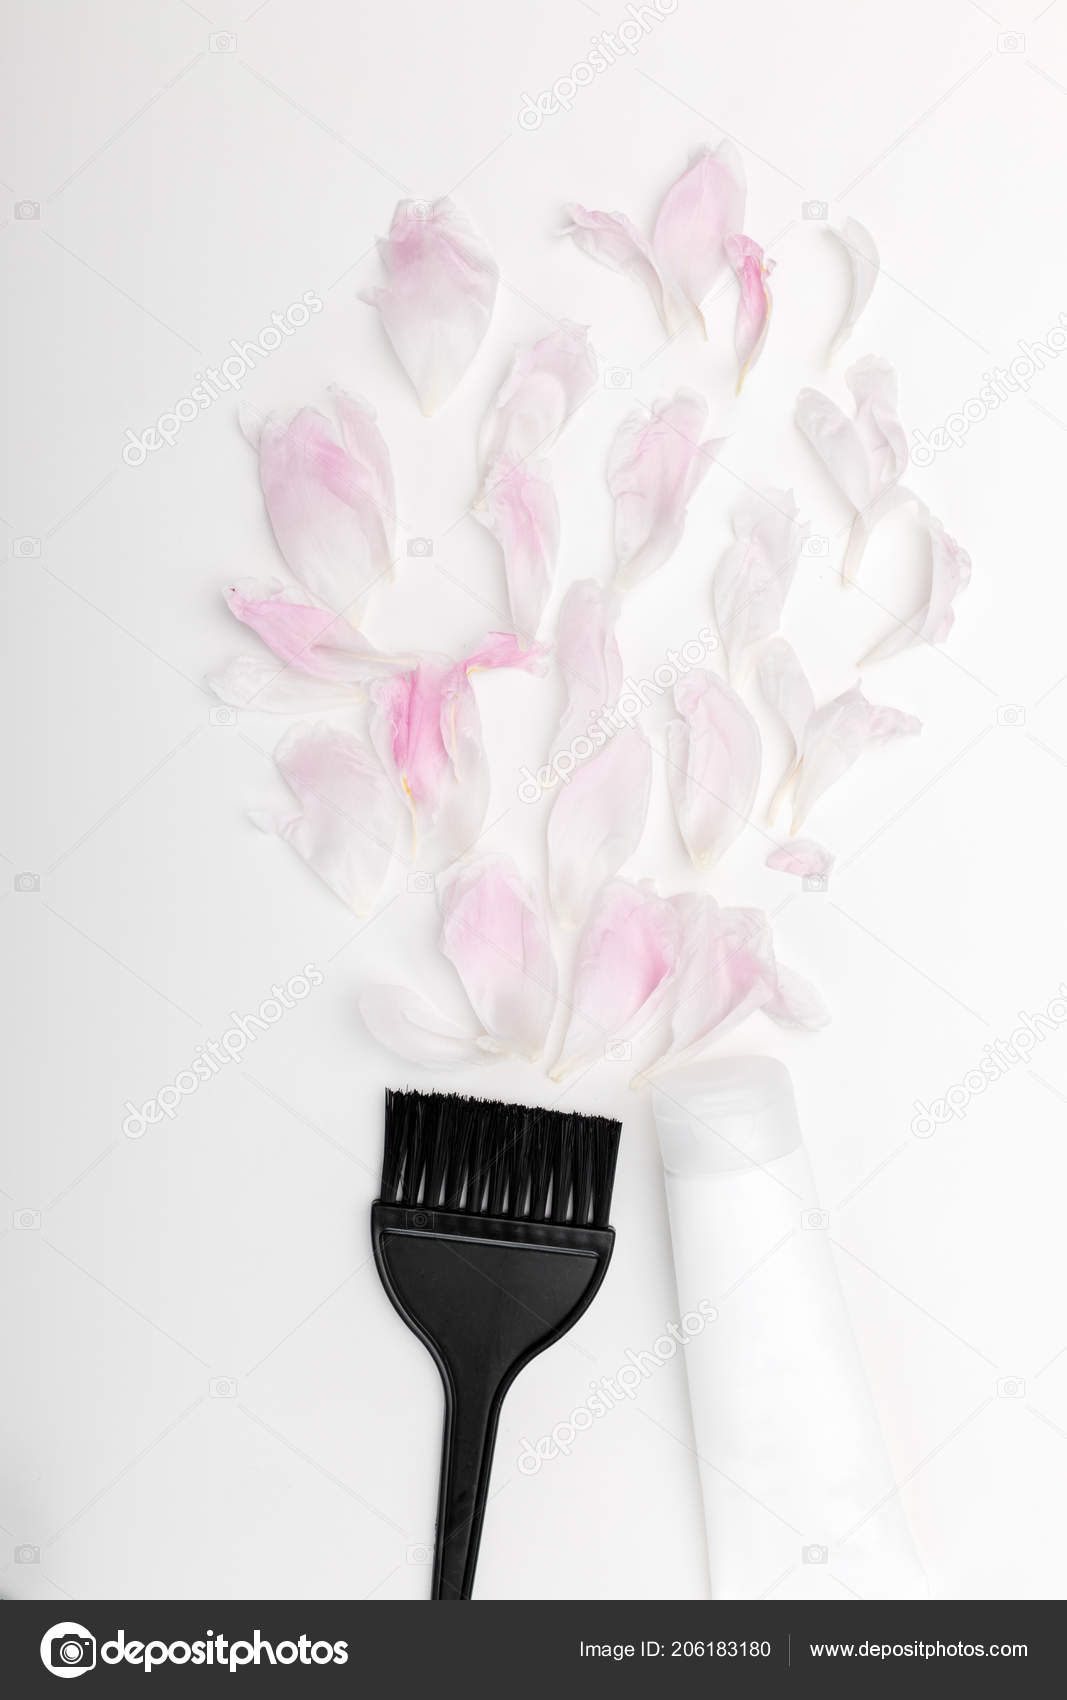 2x Salon Beauty Hair Coloring Brush Dyeing Tint B Hairdressing Dye Tools